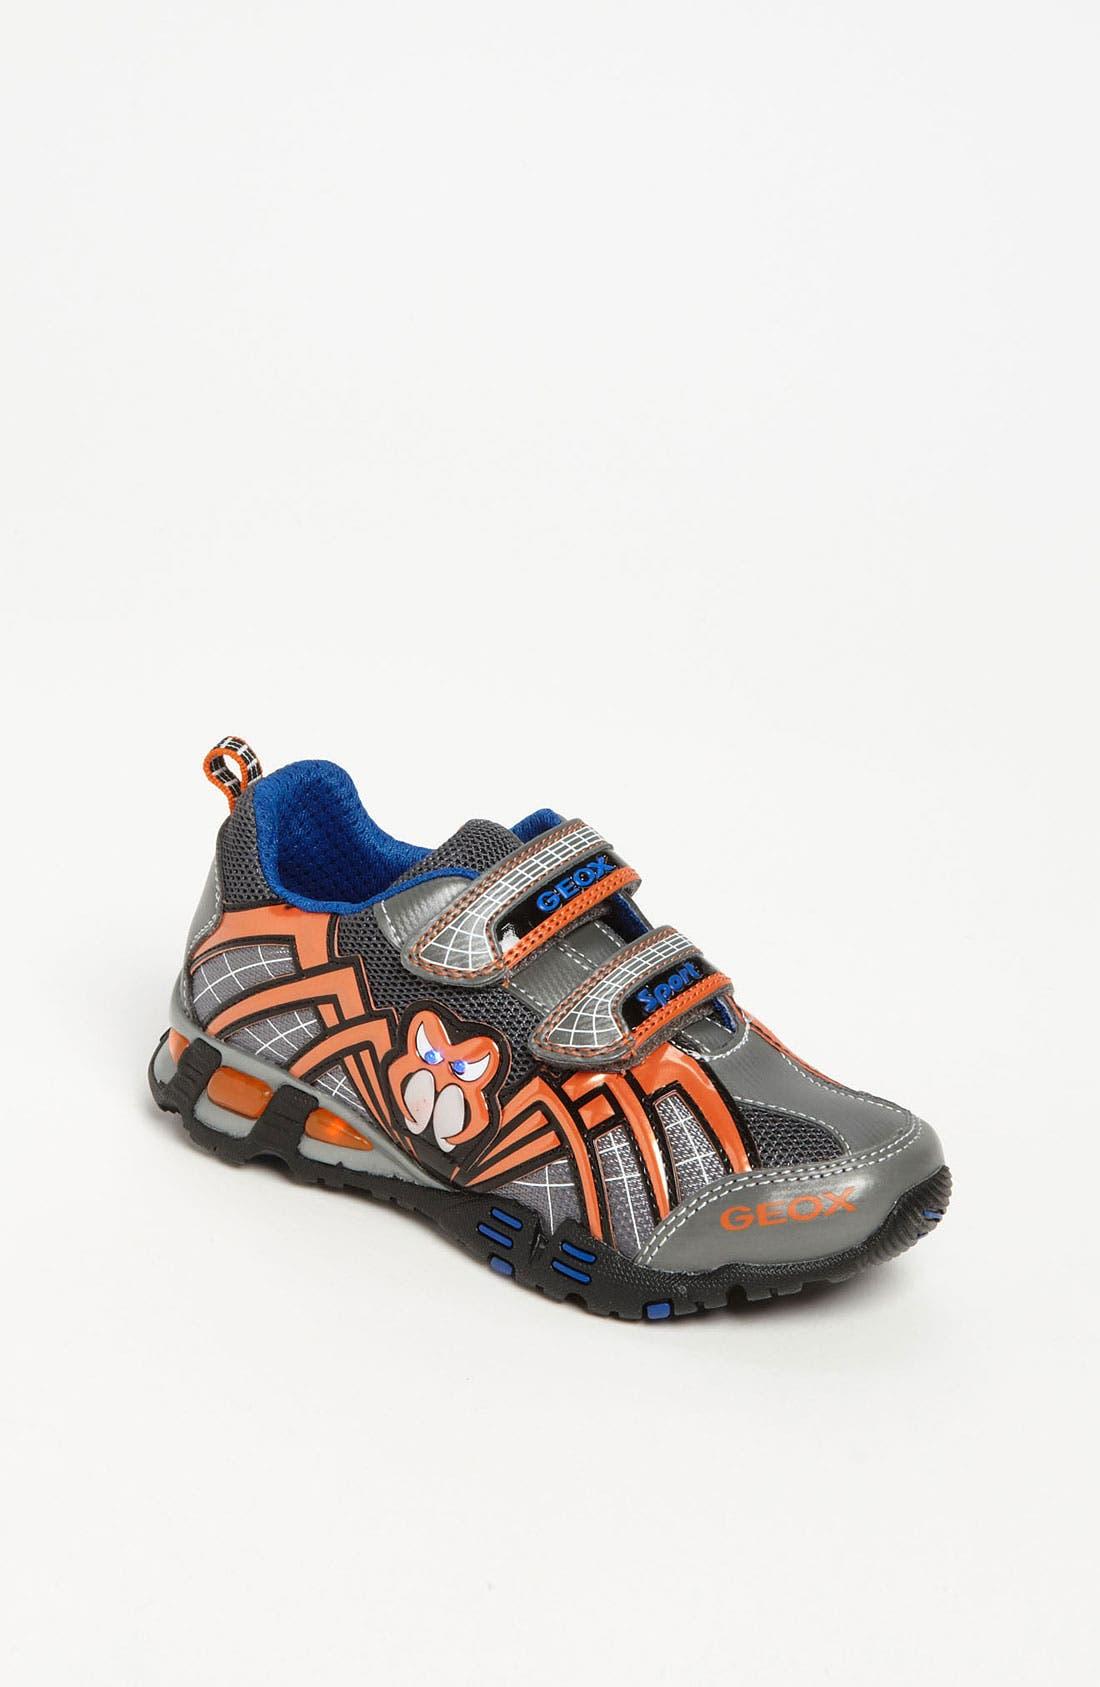 Main Image - Geox 'J Eclipse' Sneaker (Toddler, Little Kid & Big Kid)